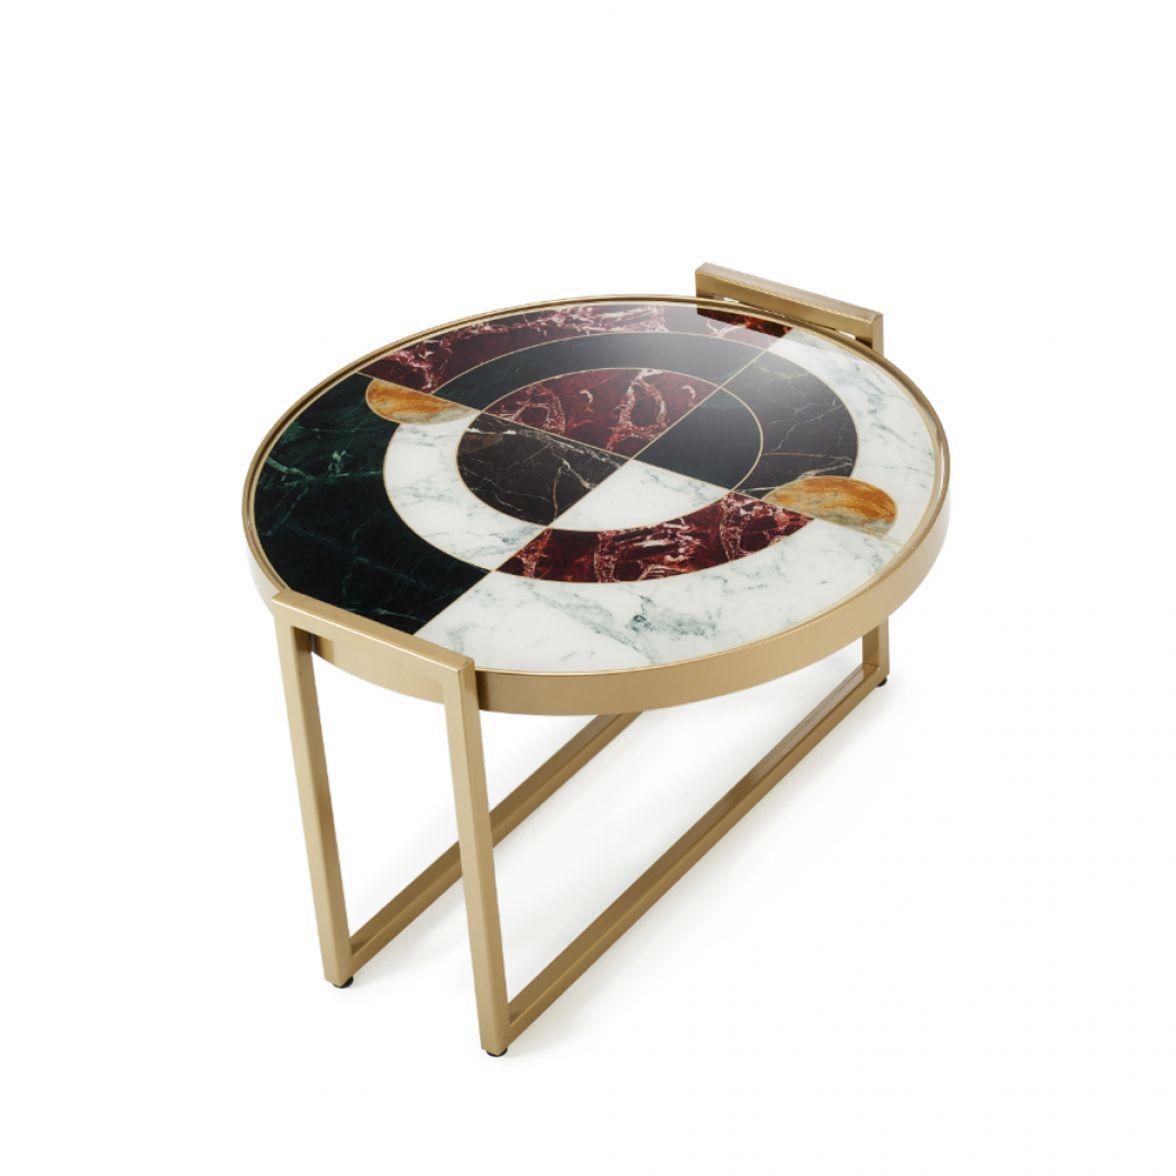 Norman coffee table фото цена